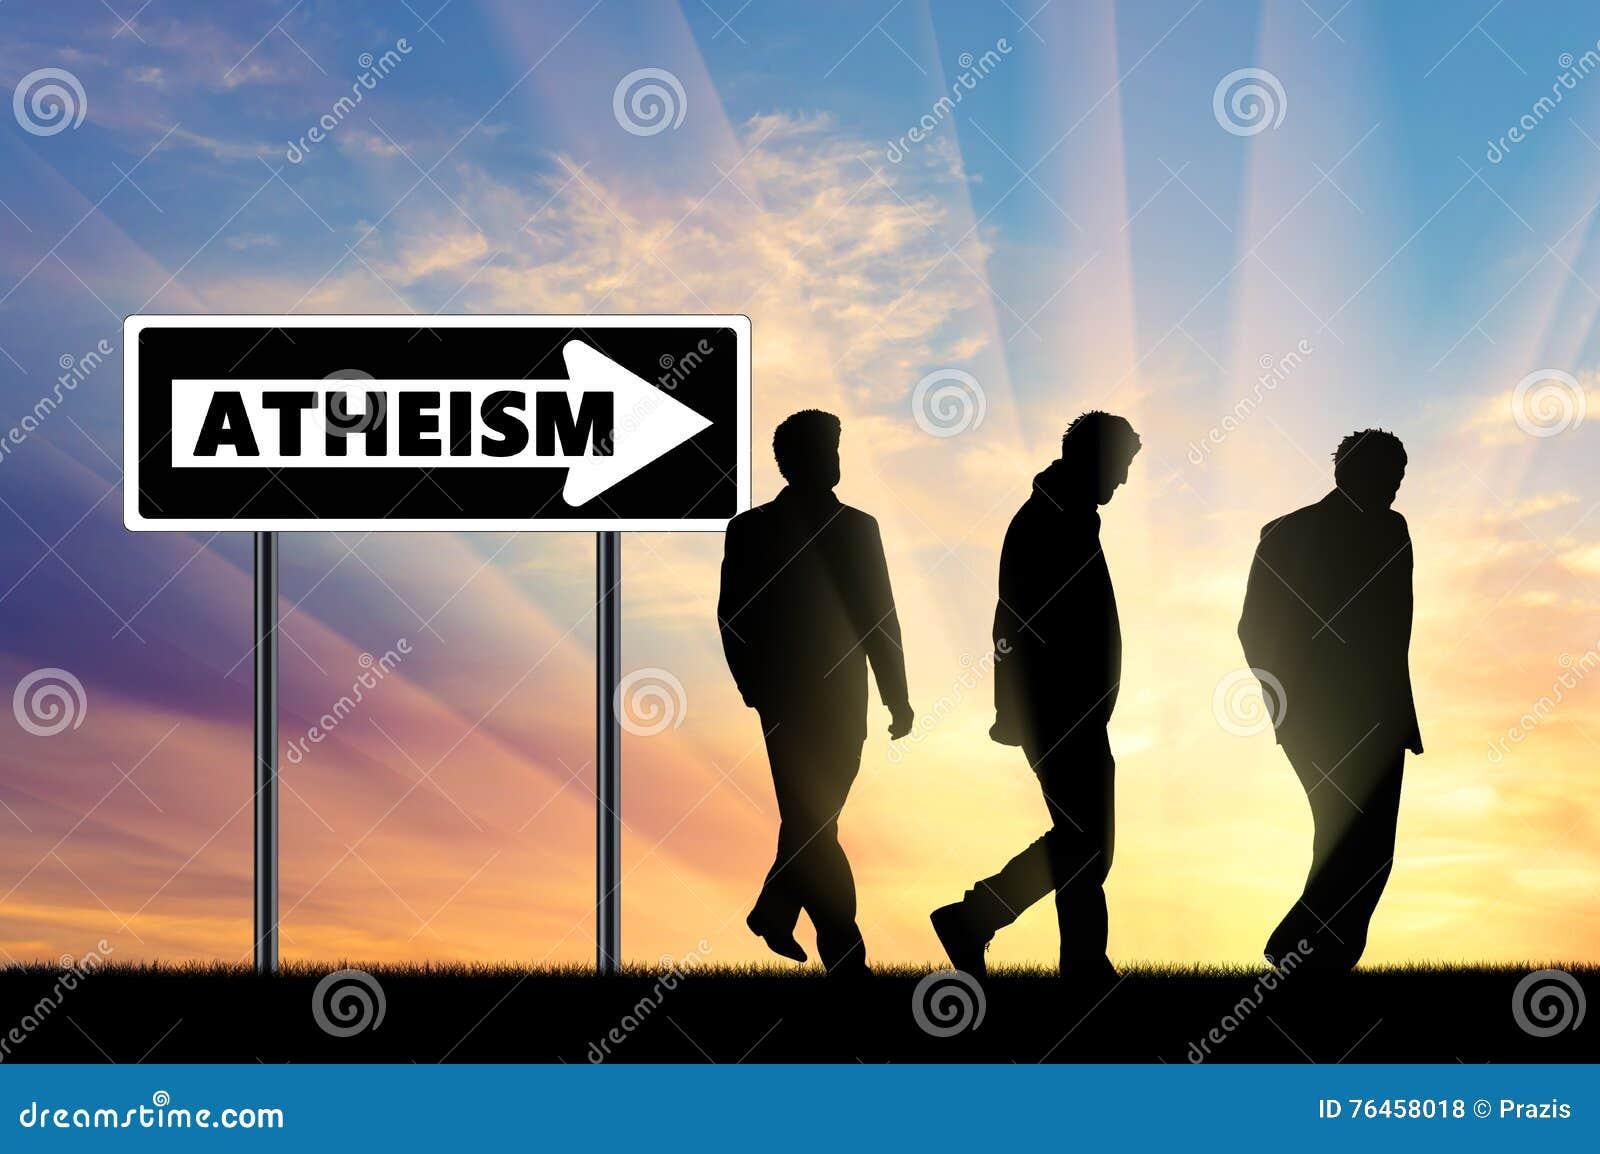 Atheism Ateos tres hombres